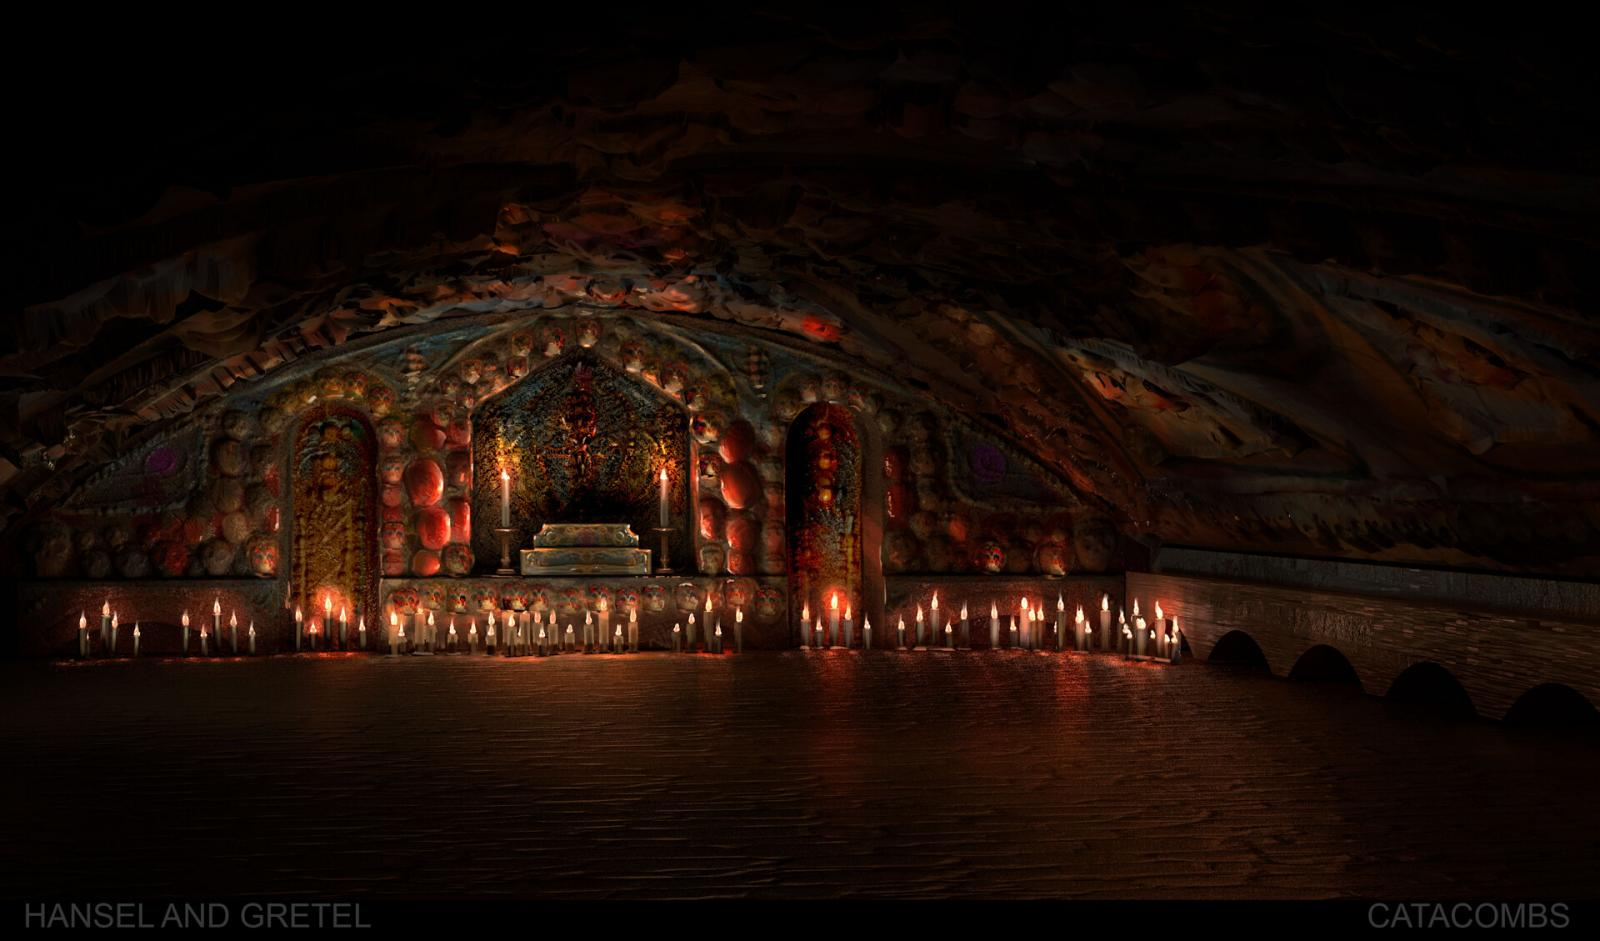 goran-delic-hansel-and-gretel-catacombs.jpg